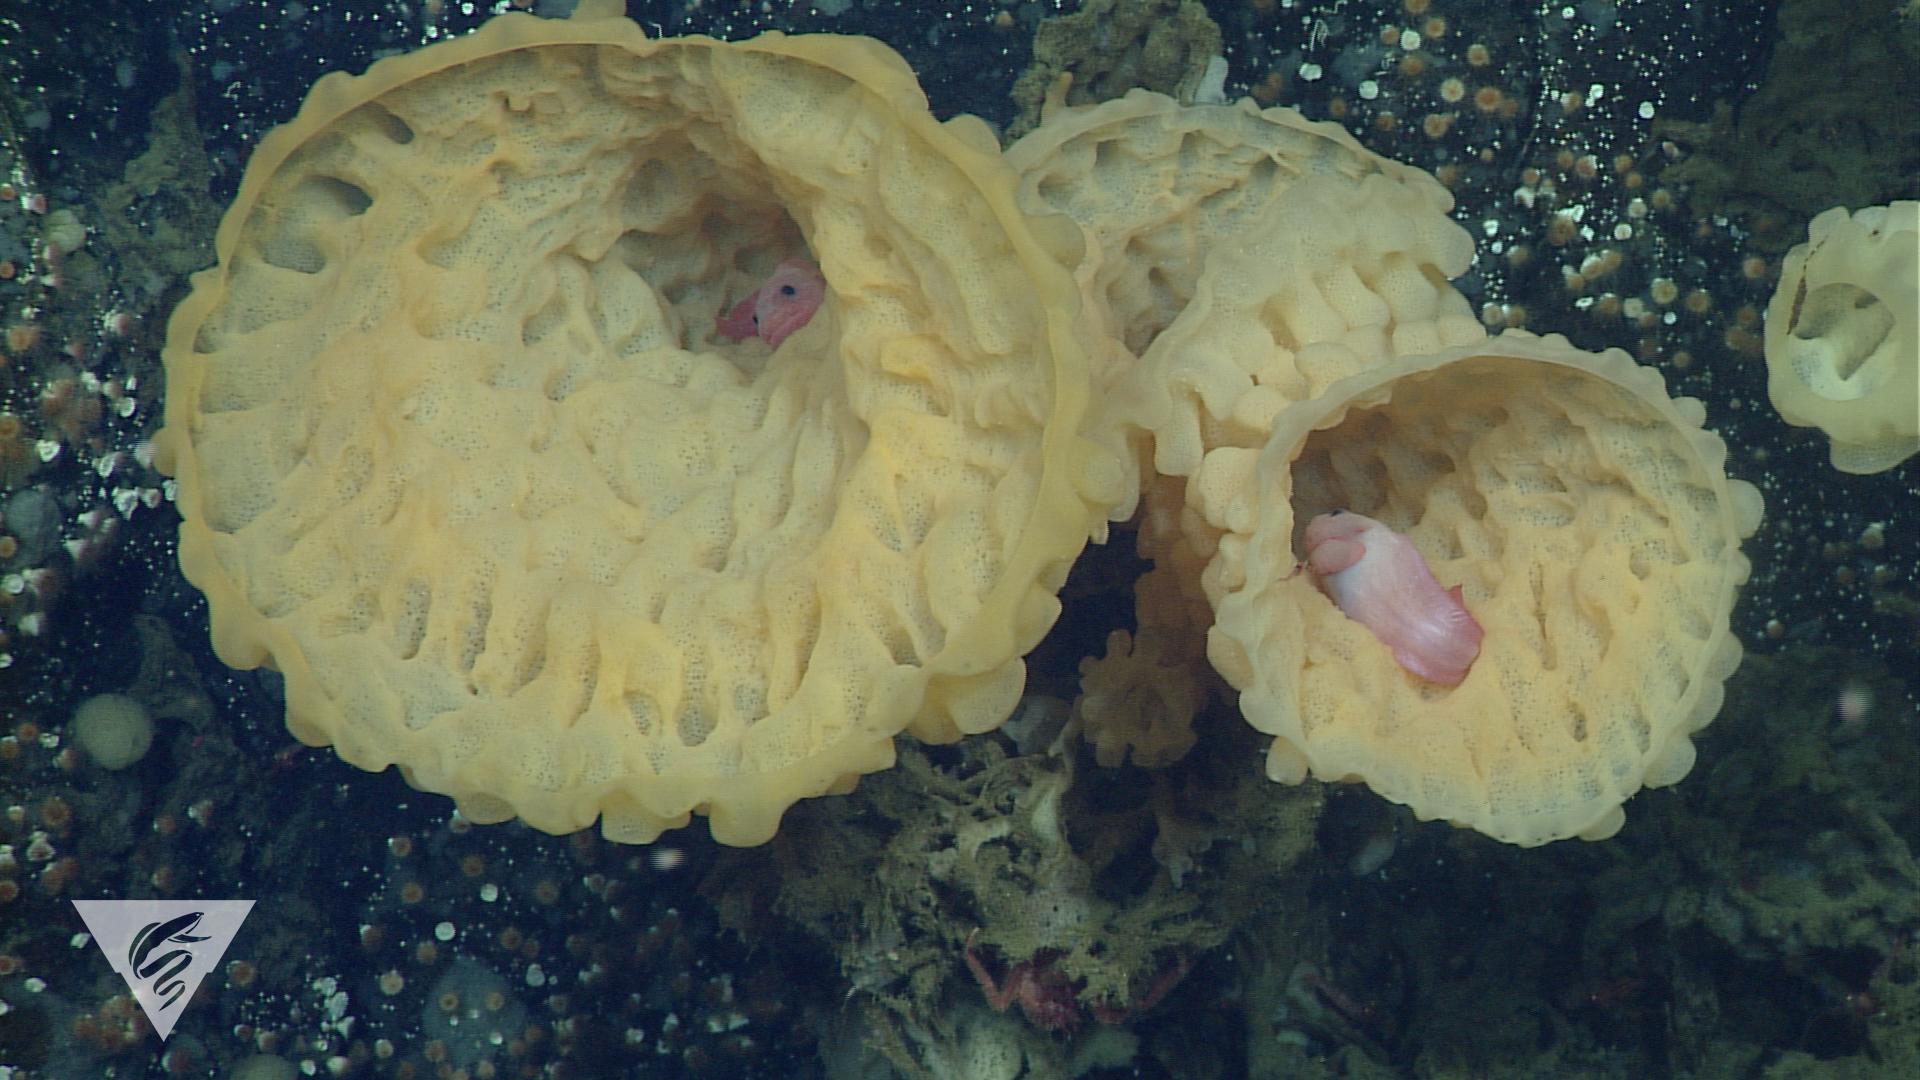 Snailfish hiding in sponges